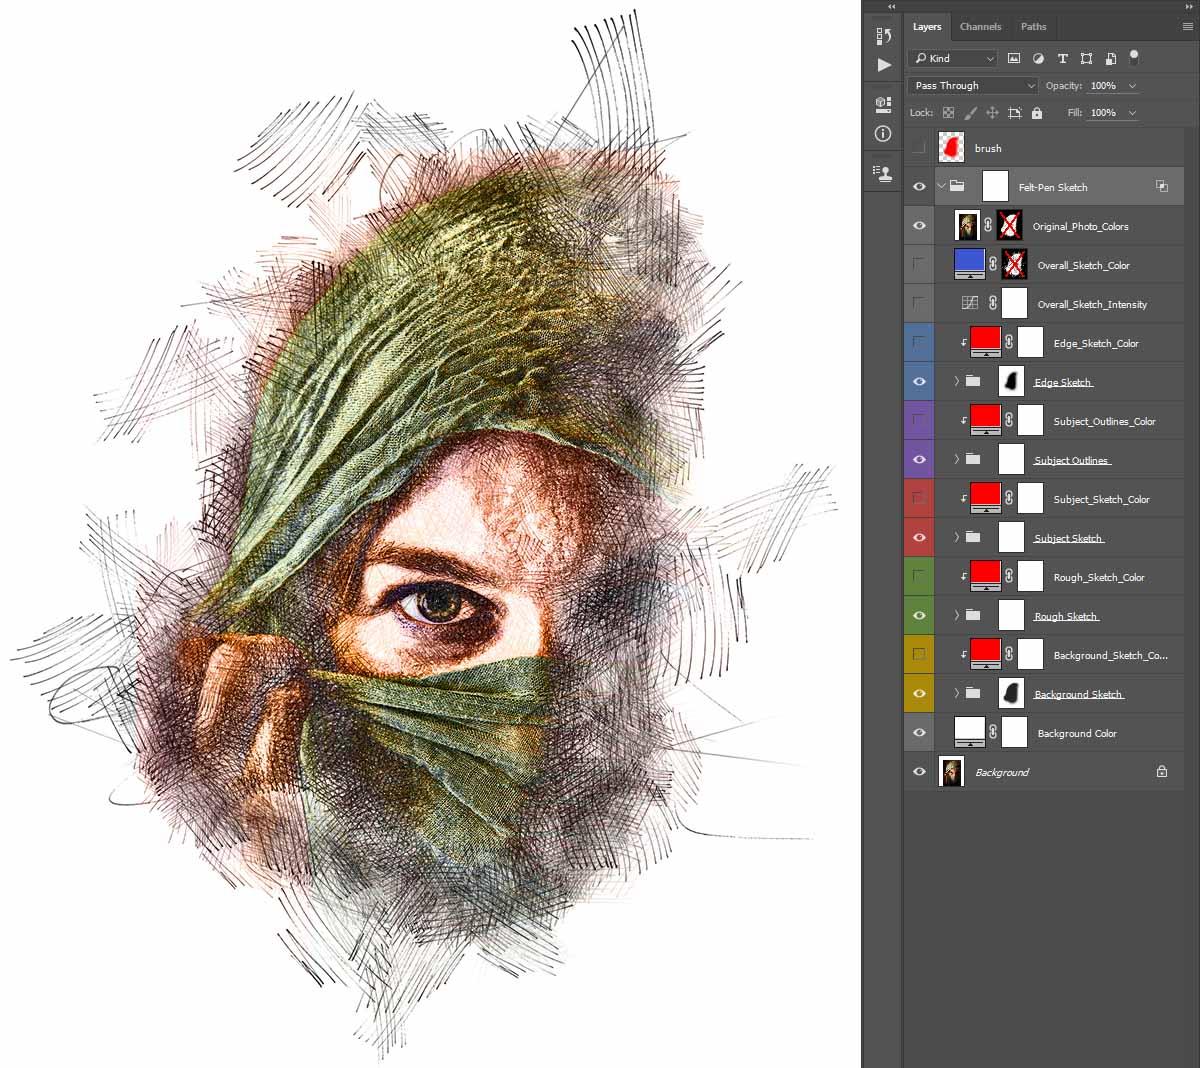 Overall_Sketch_Color Felt-Pen Sketch Photoshop Action